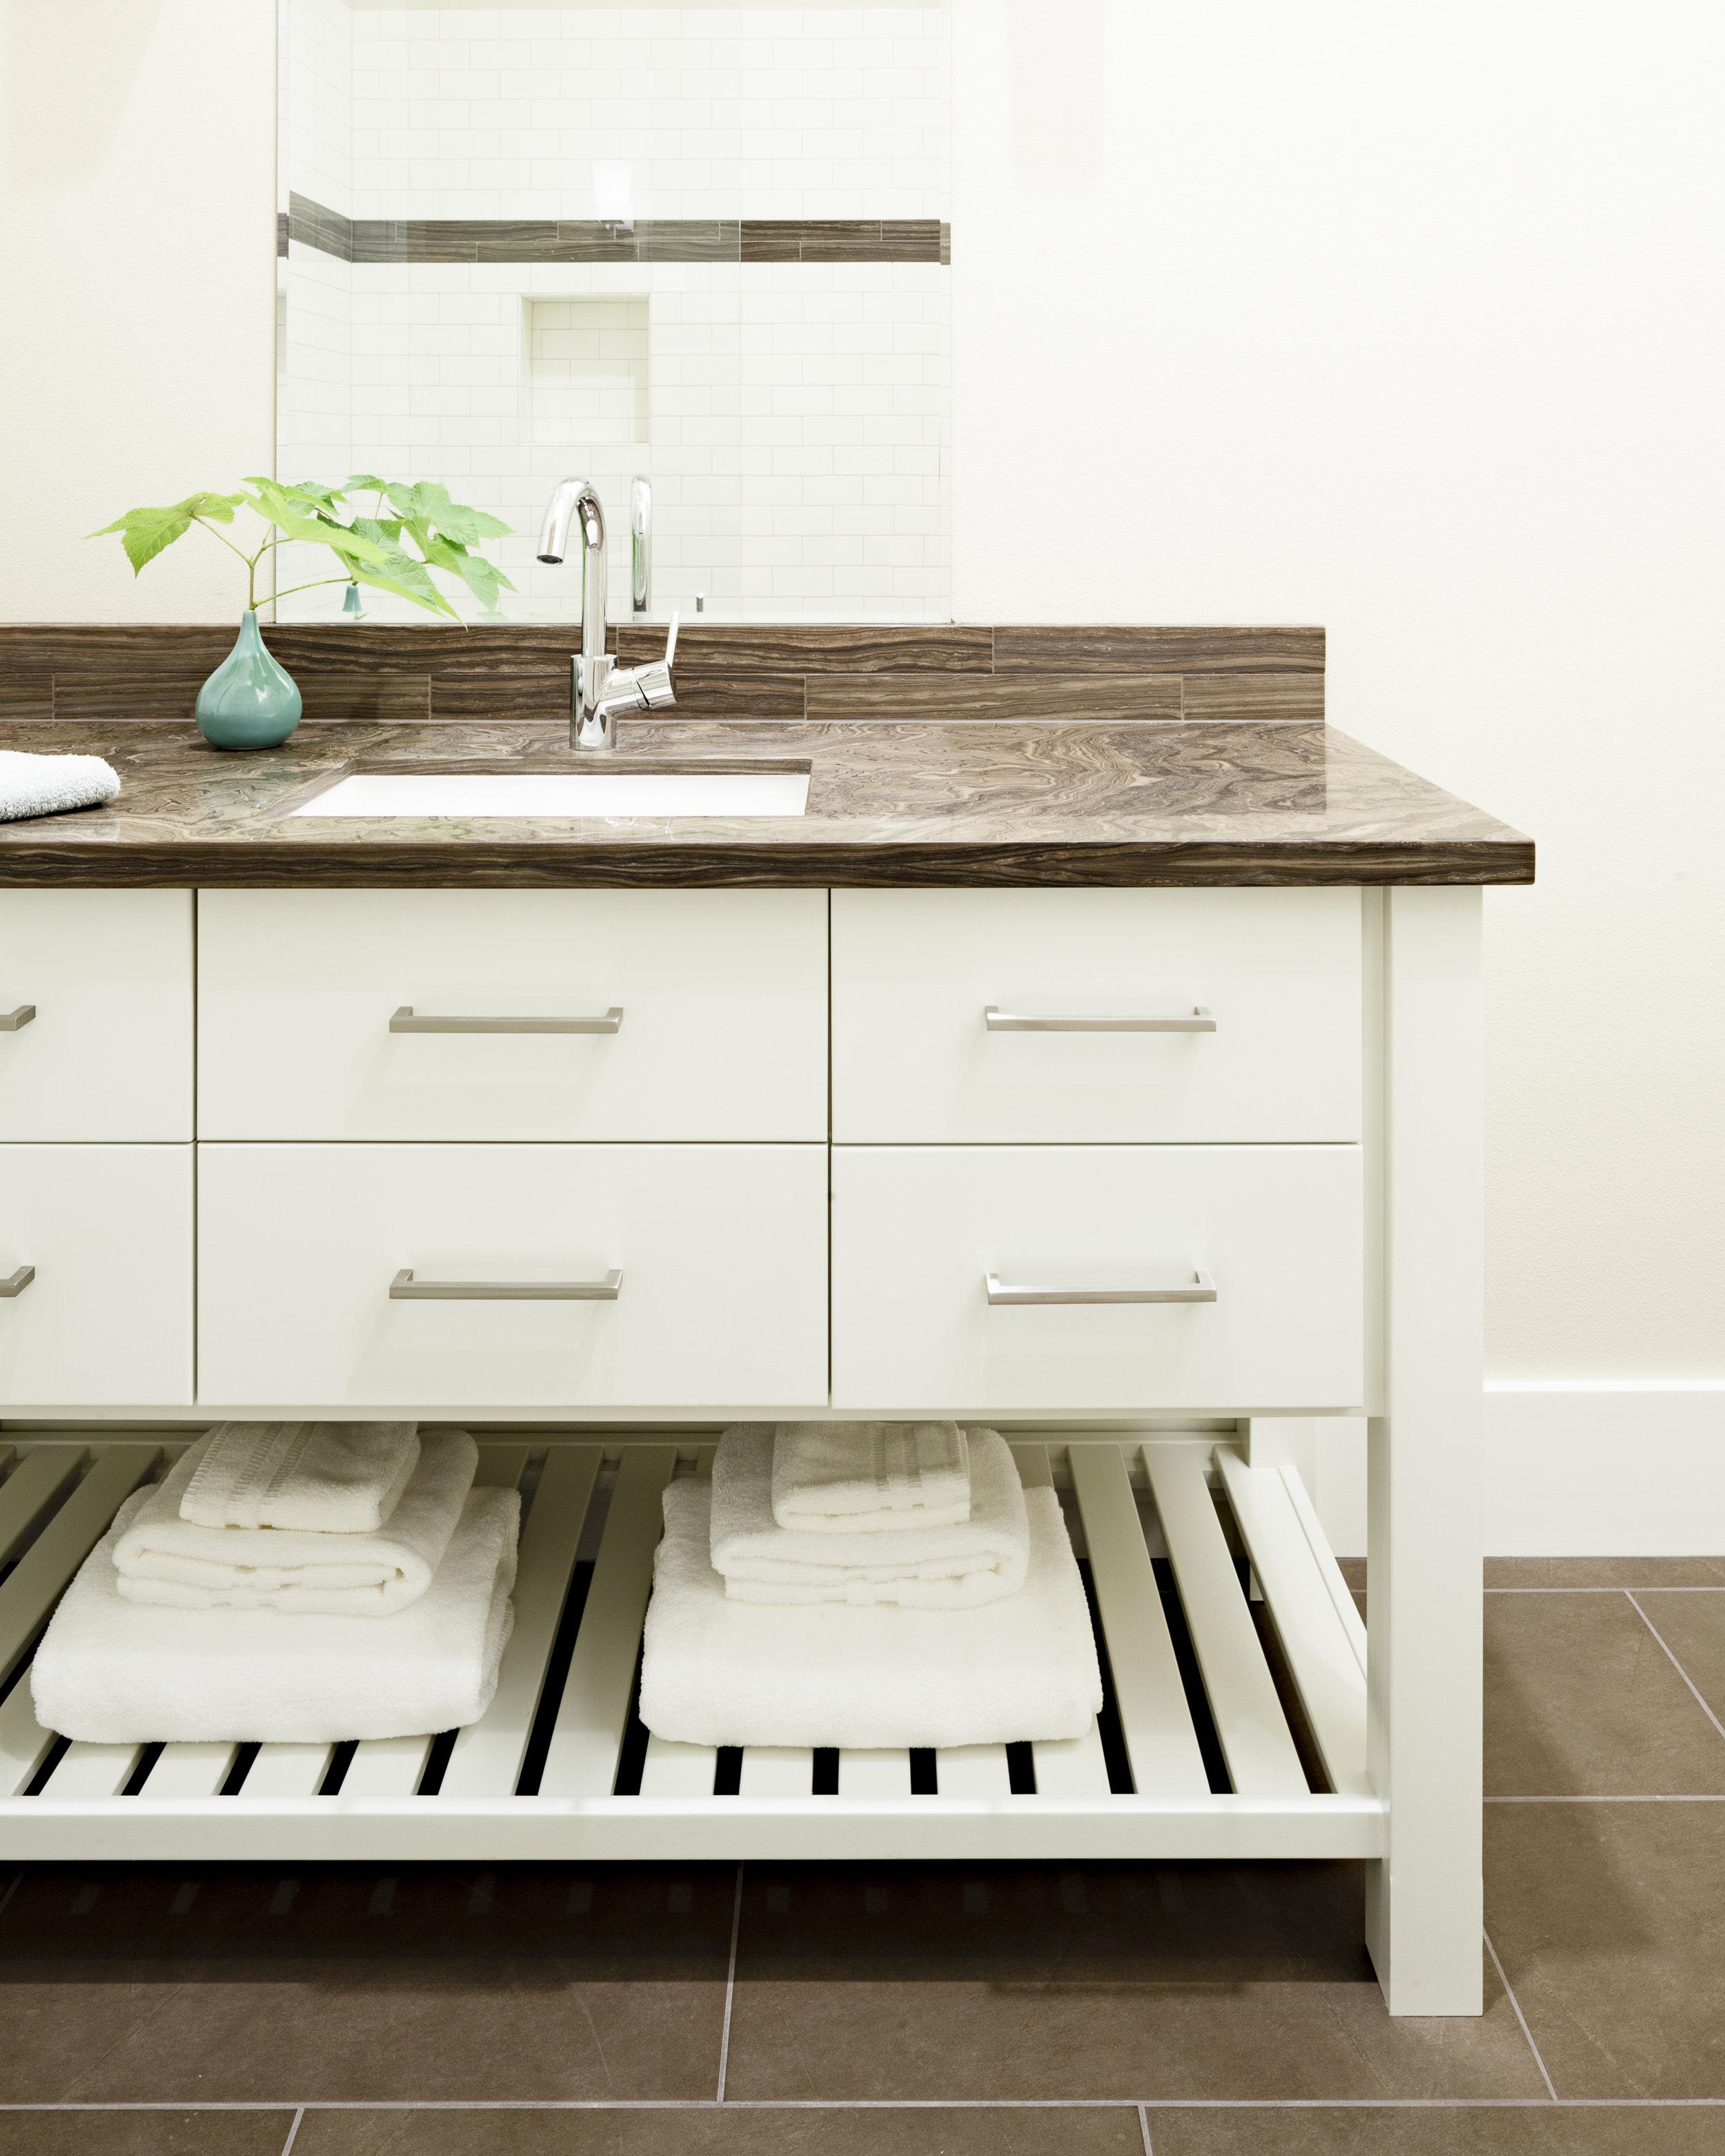 Jenni-Leasia-Design-minimal-bathroom-contemporary-counter (1).jpg